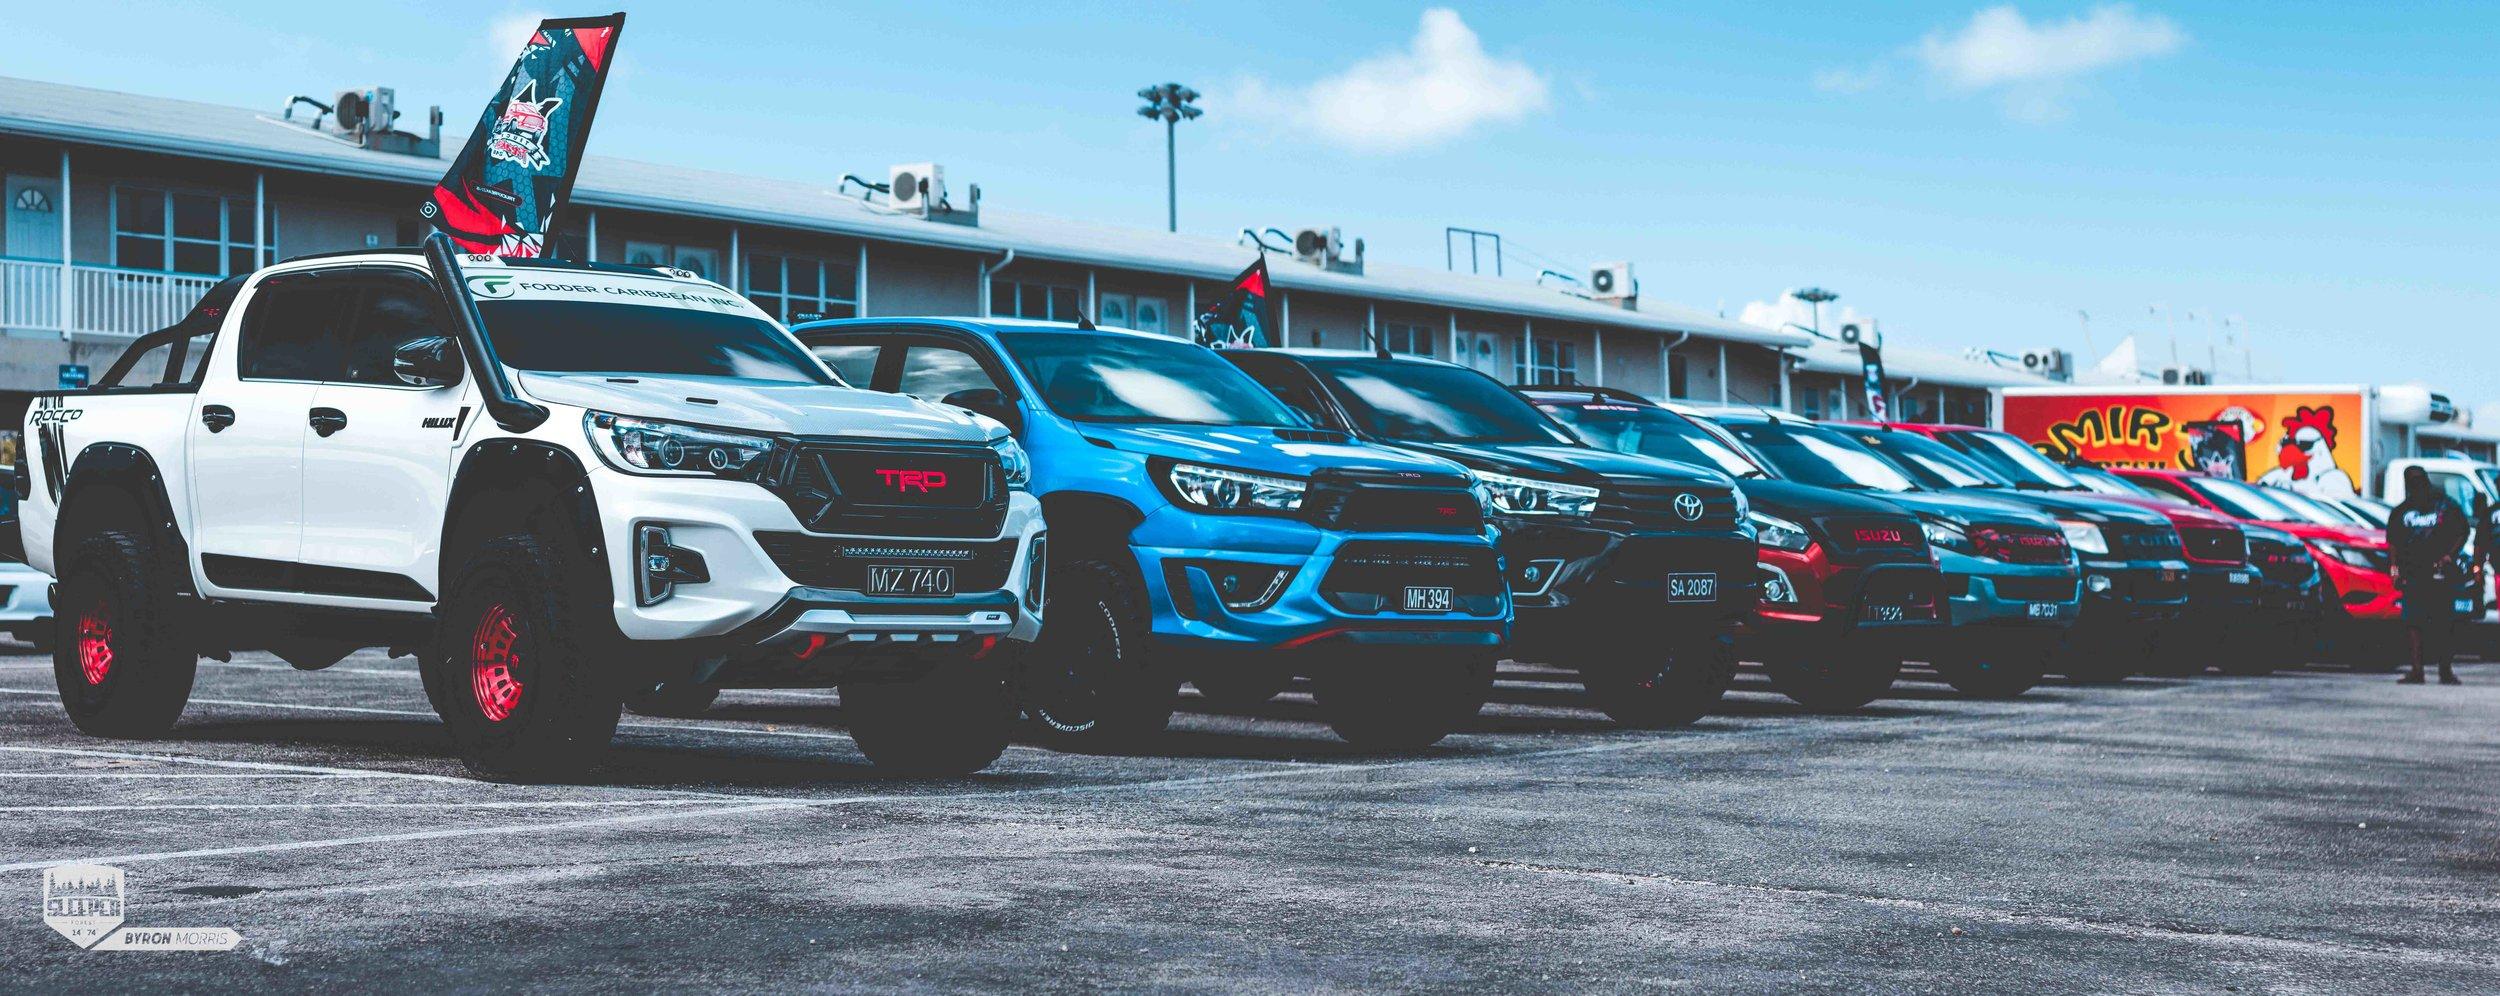 Rep_ya_ride_2019_barbados_car_culture-12.jpg